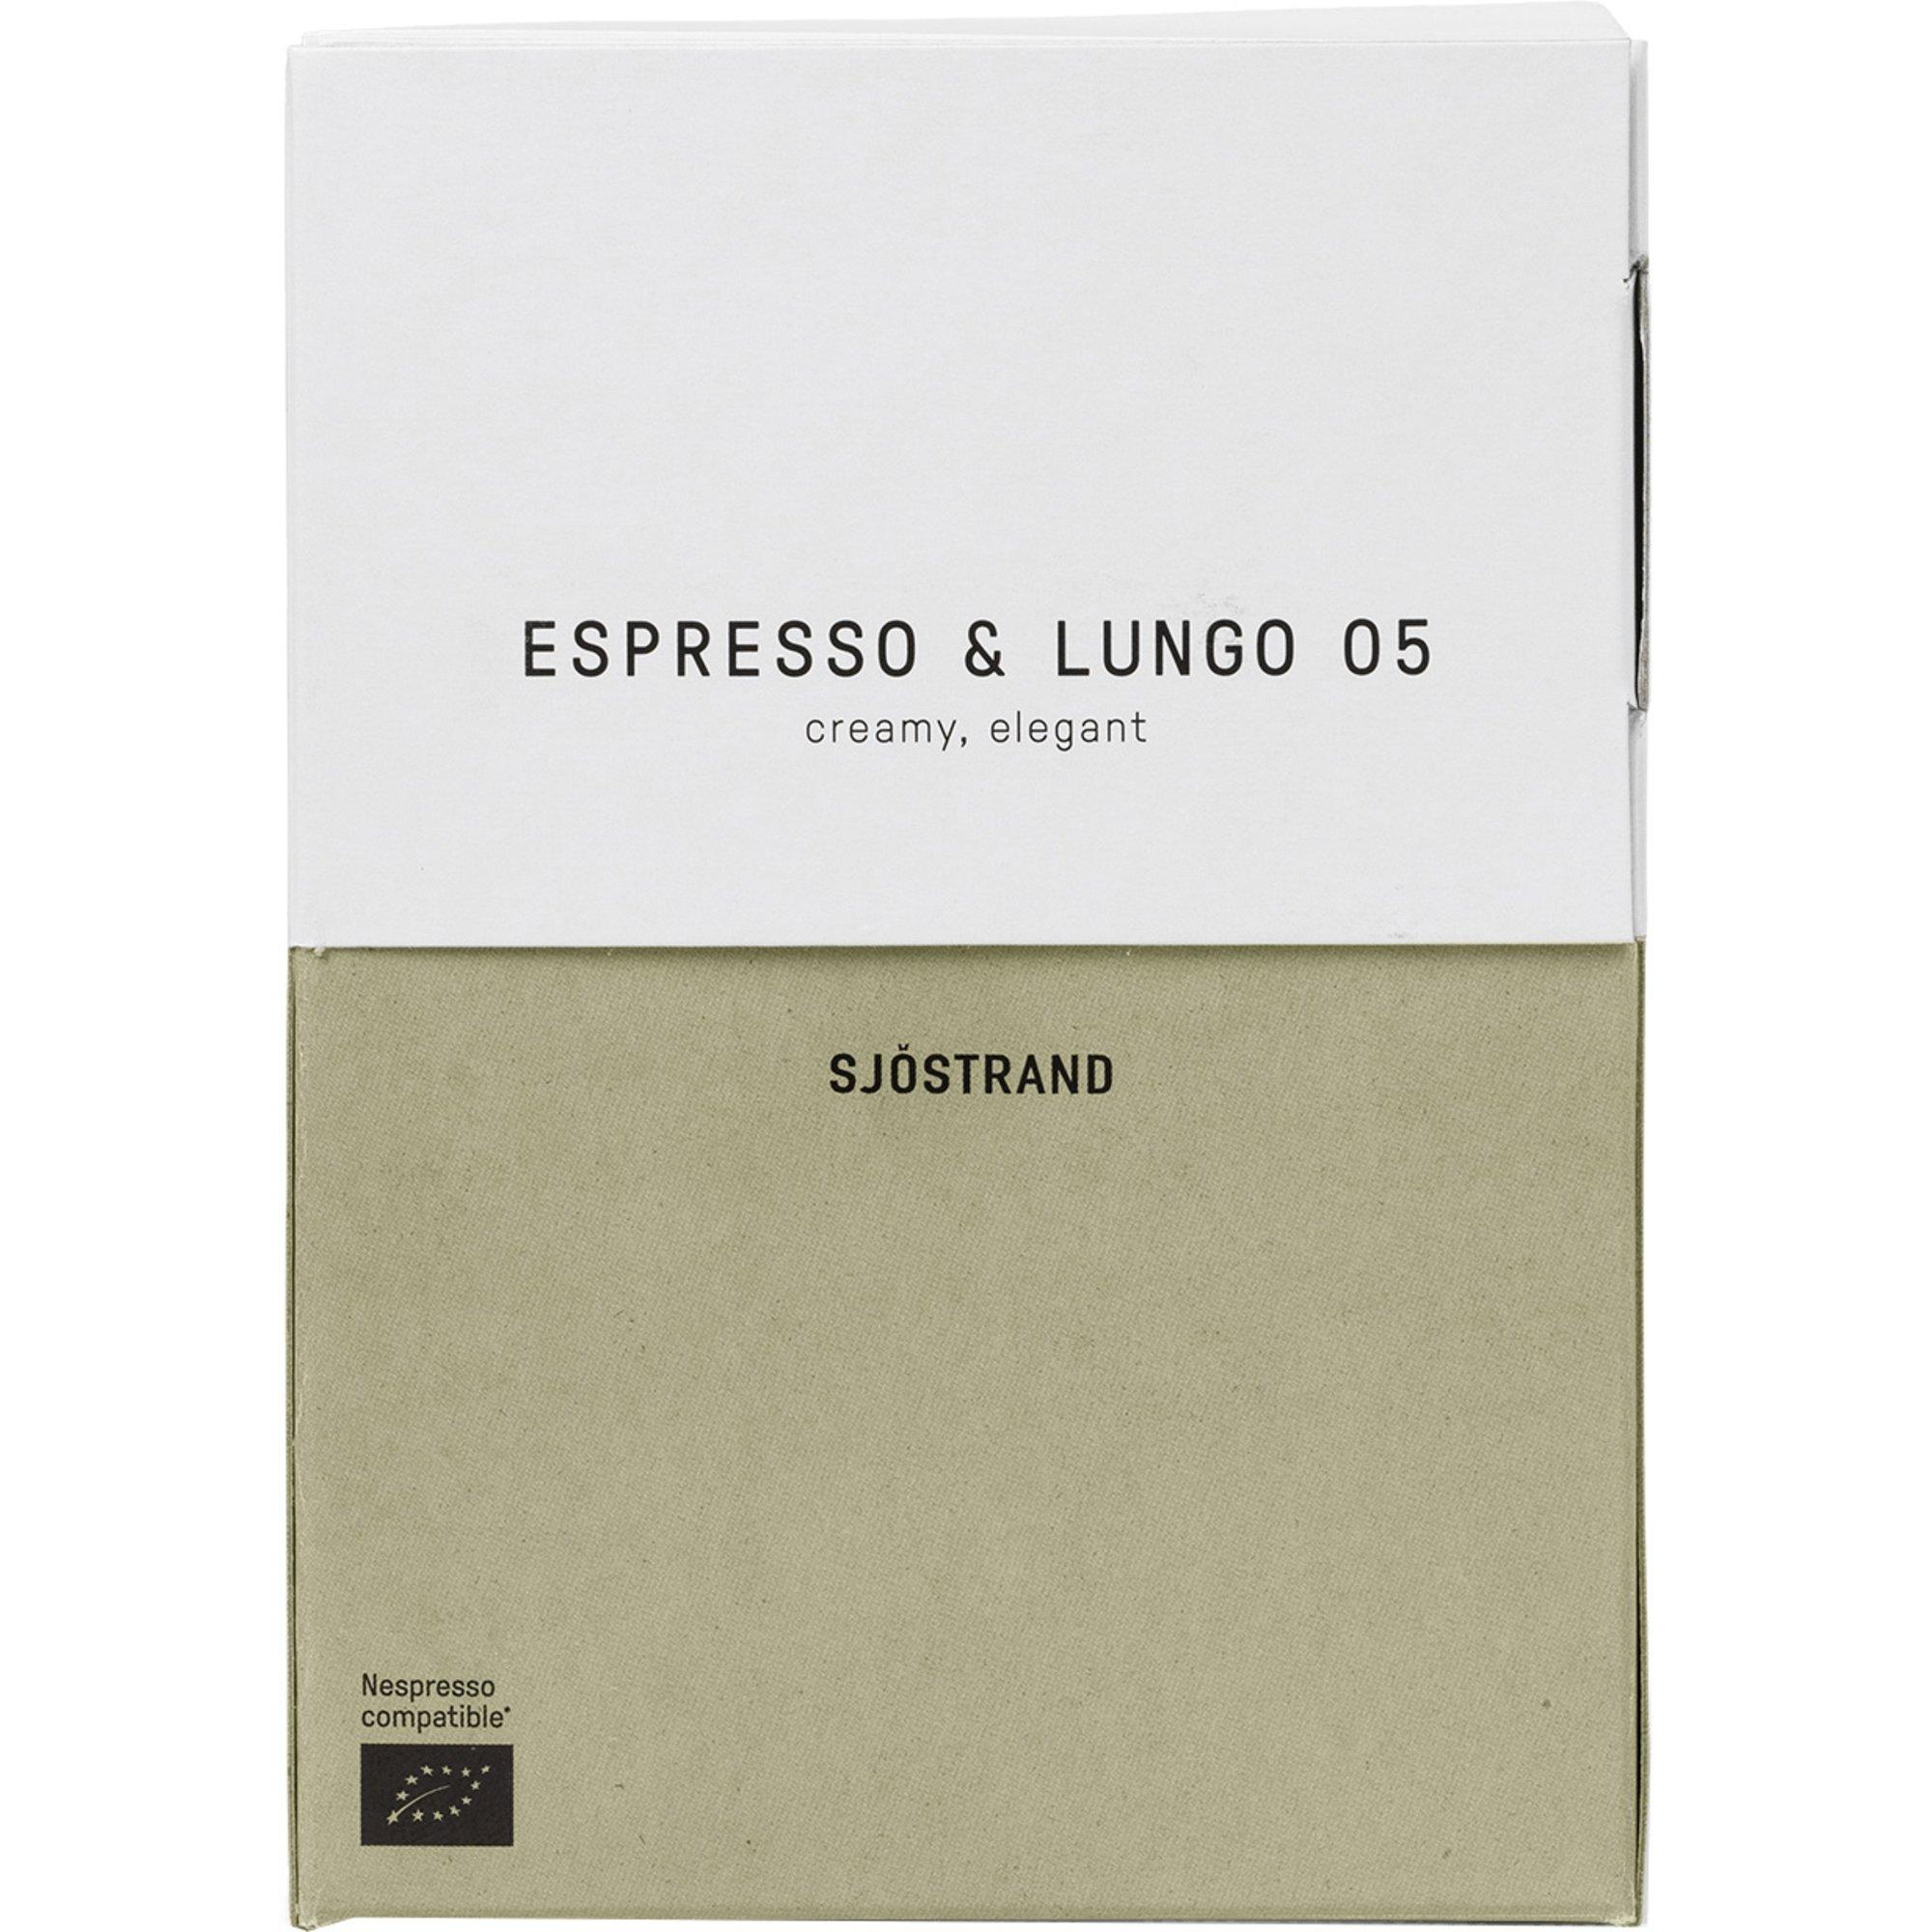 Sjöstrand N°5 Espresso & Lungo kaffekapslar 100 st